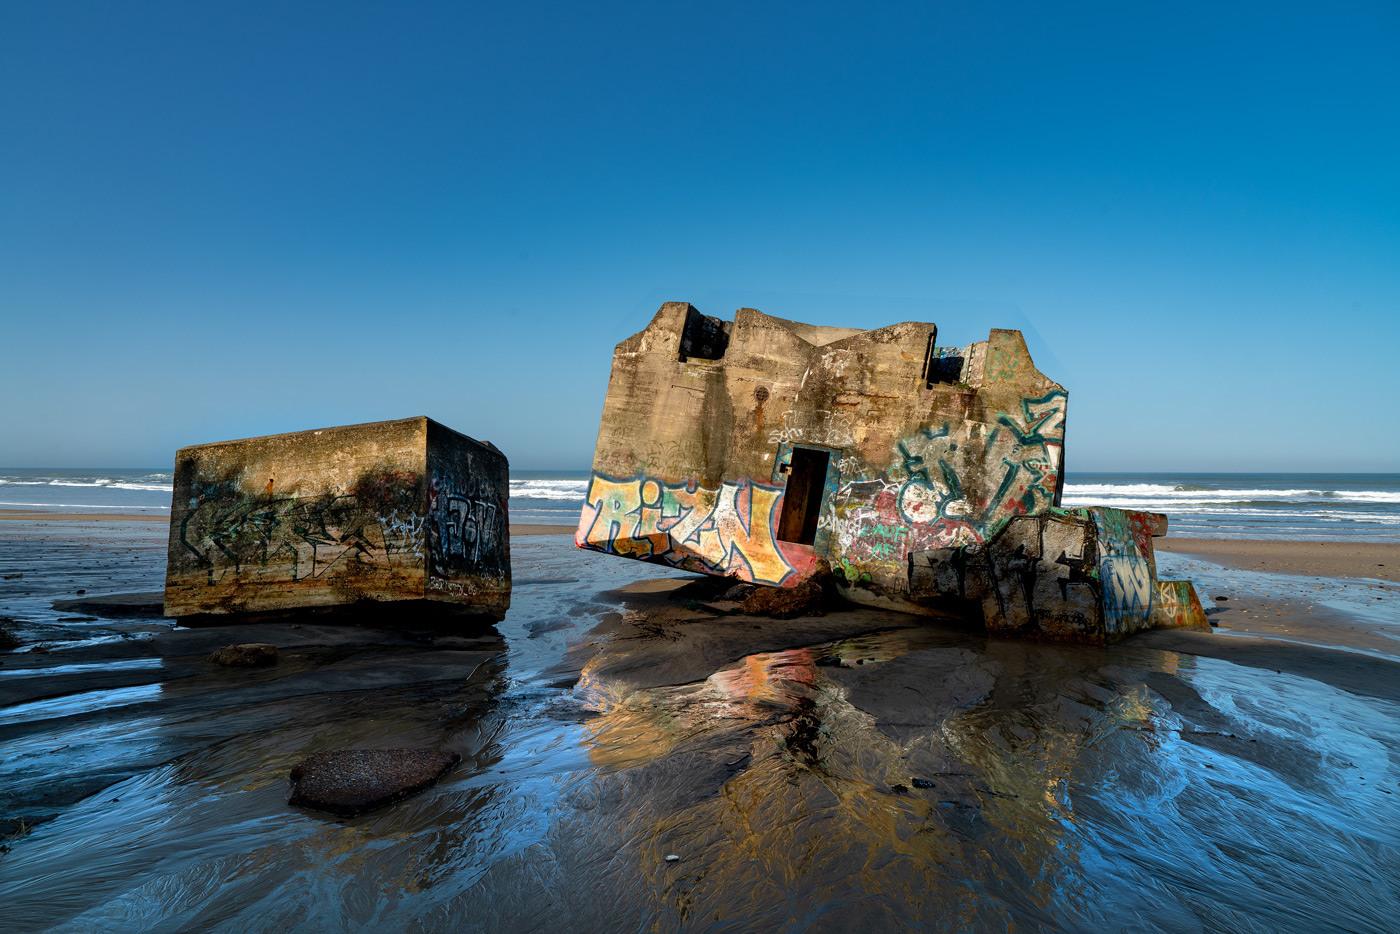 DSC00570_Naujac-sur-Mer_R600-Bunker-am-Strand-morgens-unret